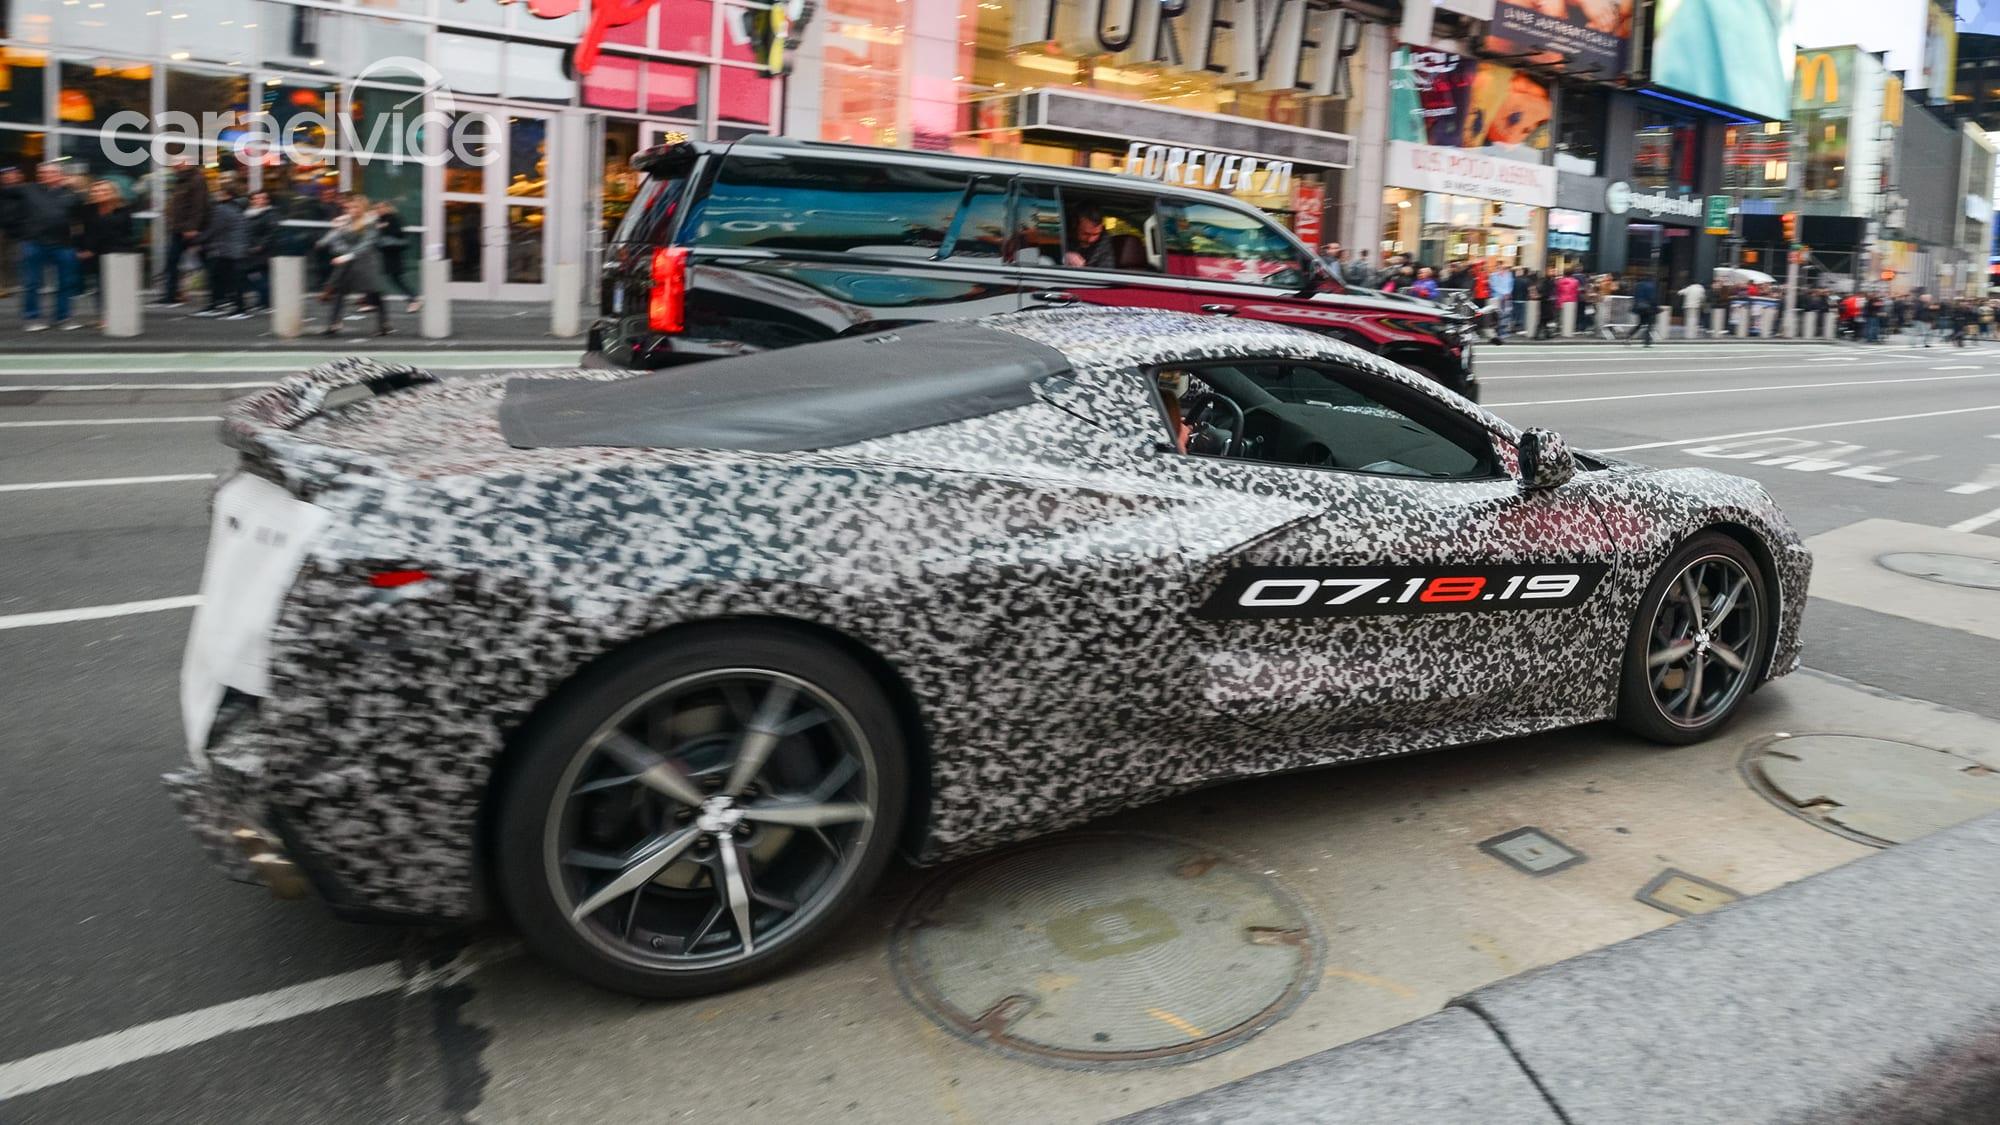 2019 - [Chevrolet] Corvette C8 Stingray - Page 4 Mlrwxz0ad5c5lgqq9xh7